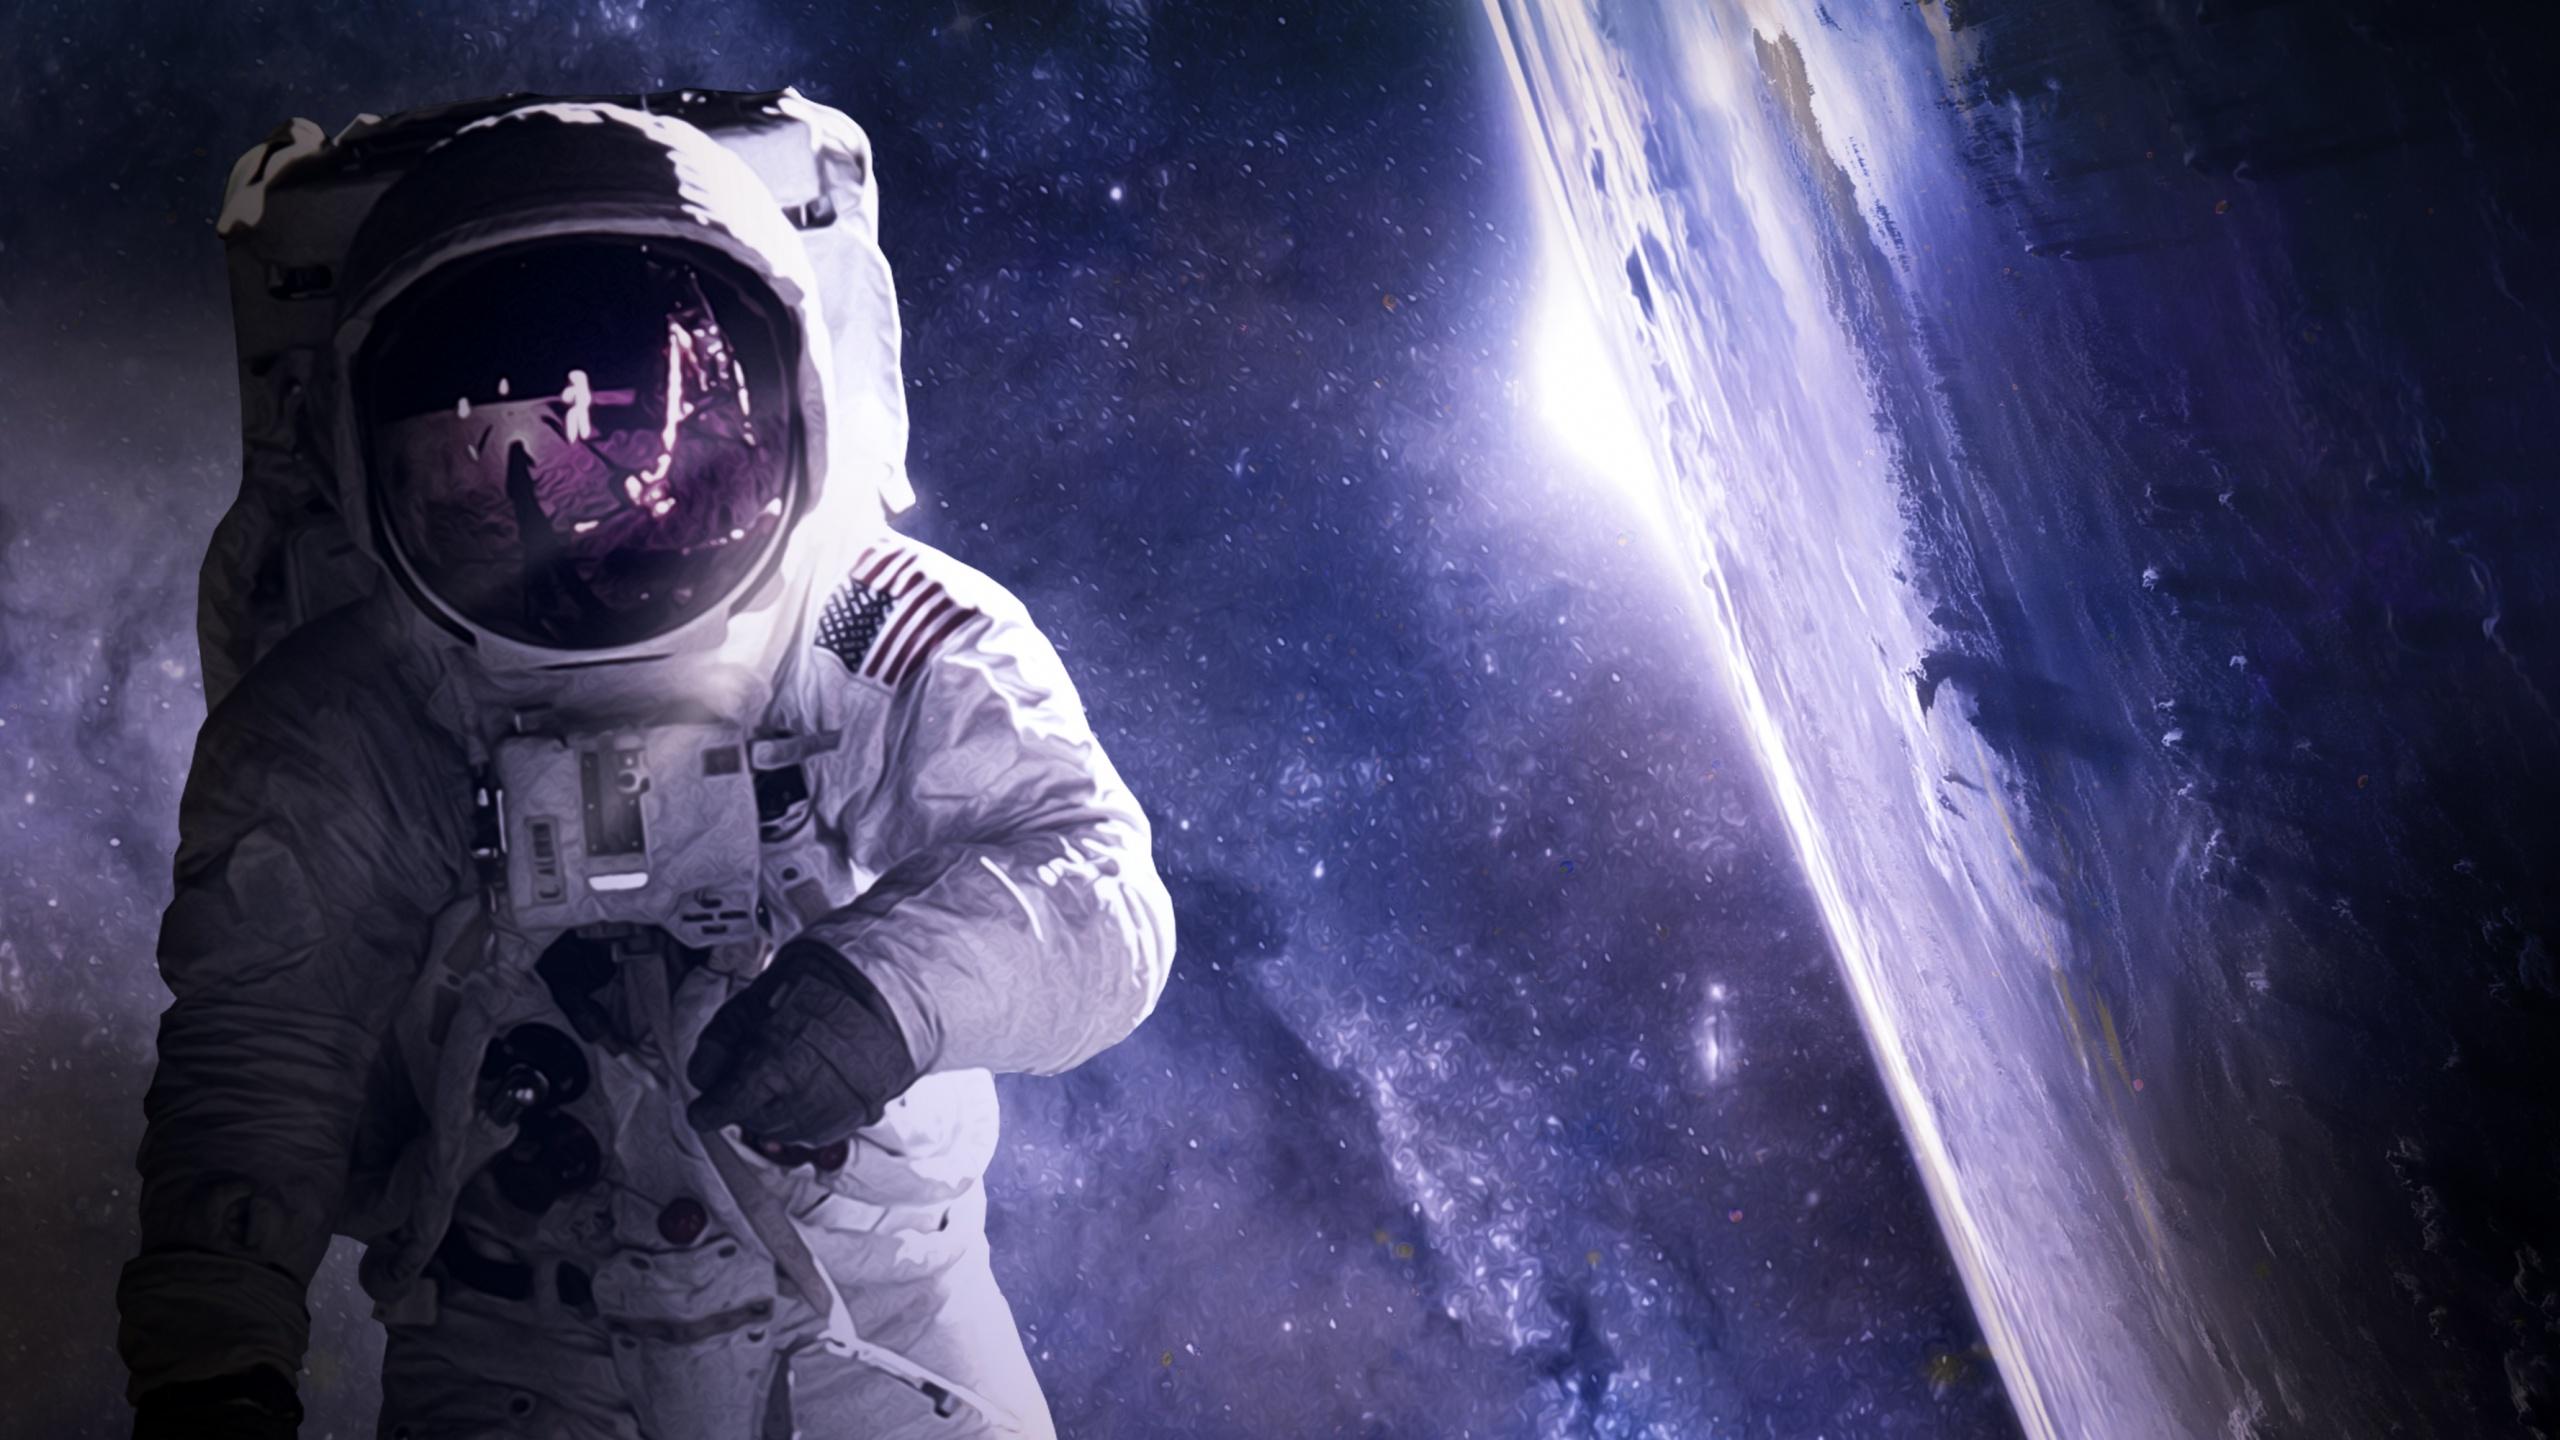 Astronaut 4k Wallpaper Plane Astronomy Usa Nasa Space 904